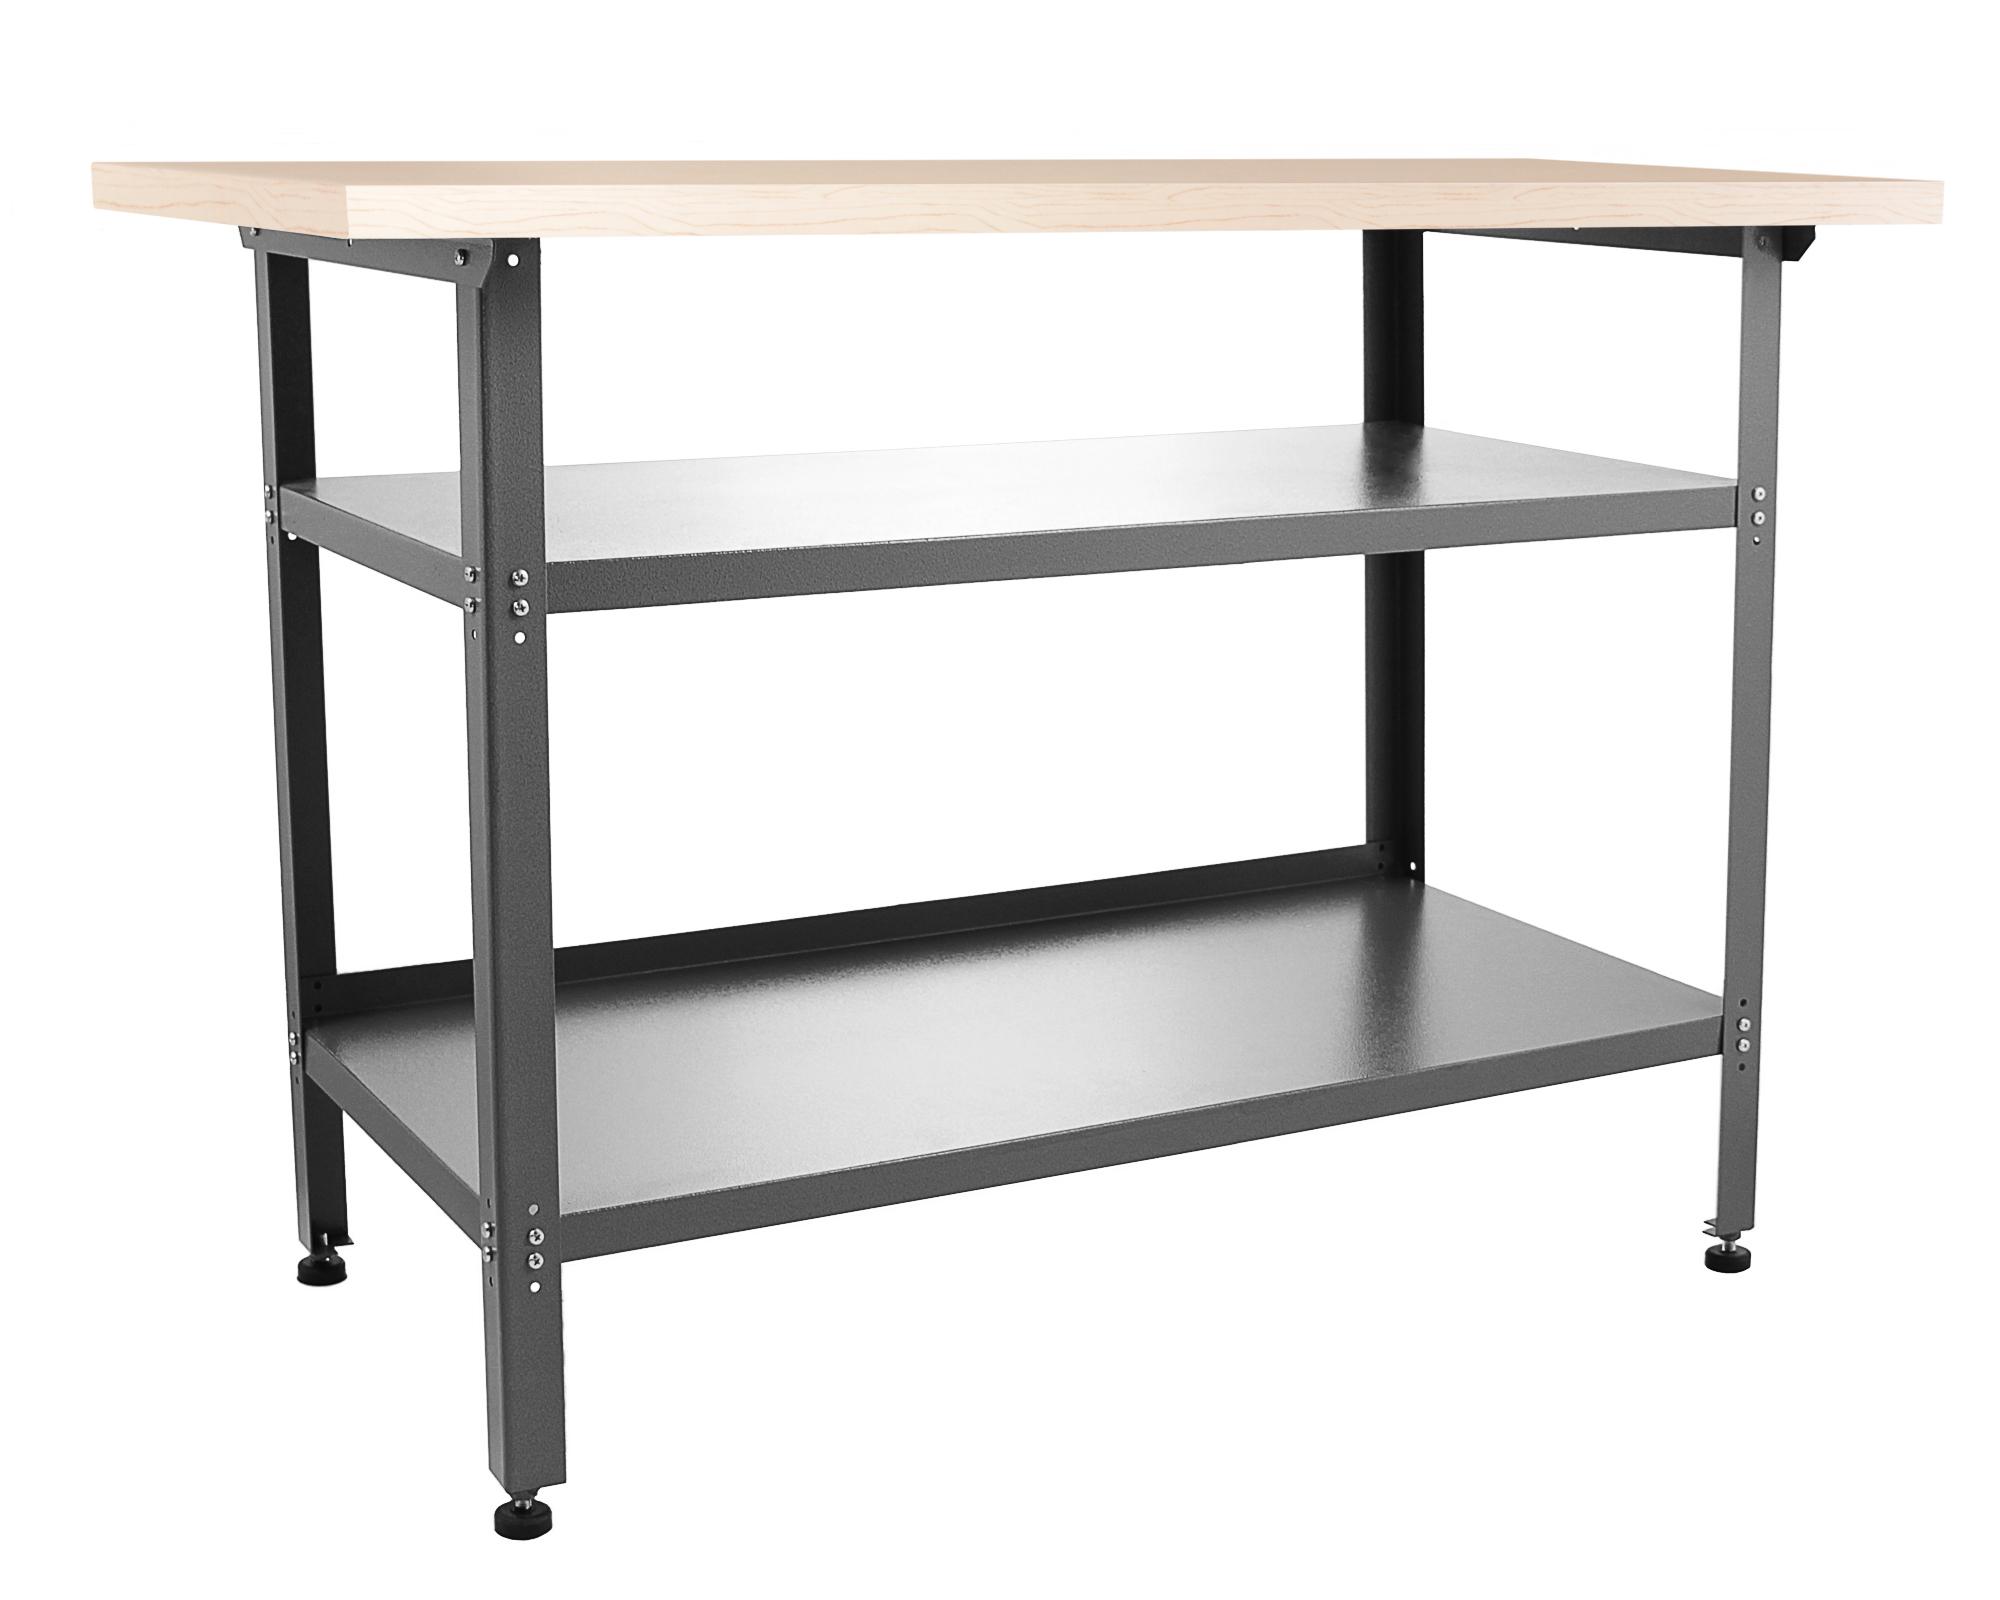 ondis24 werkbank nobbi 120 cm g nstig online kaufen. Black Bedroom Furniture Sets. Home Design Ideas